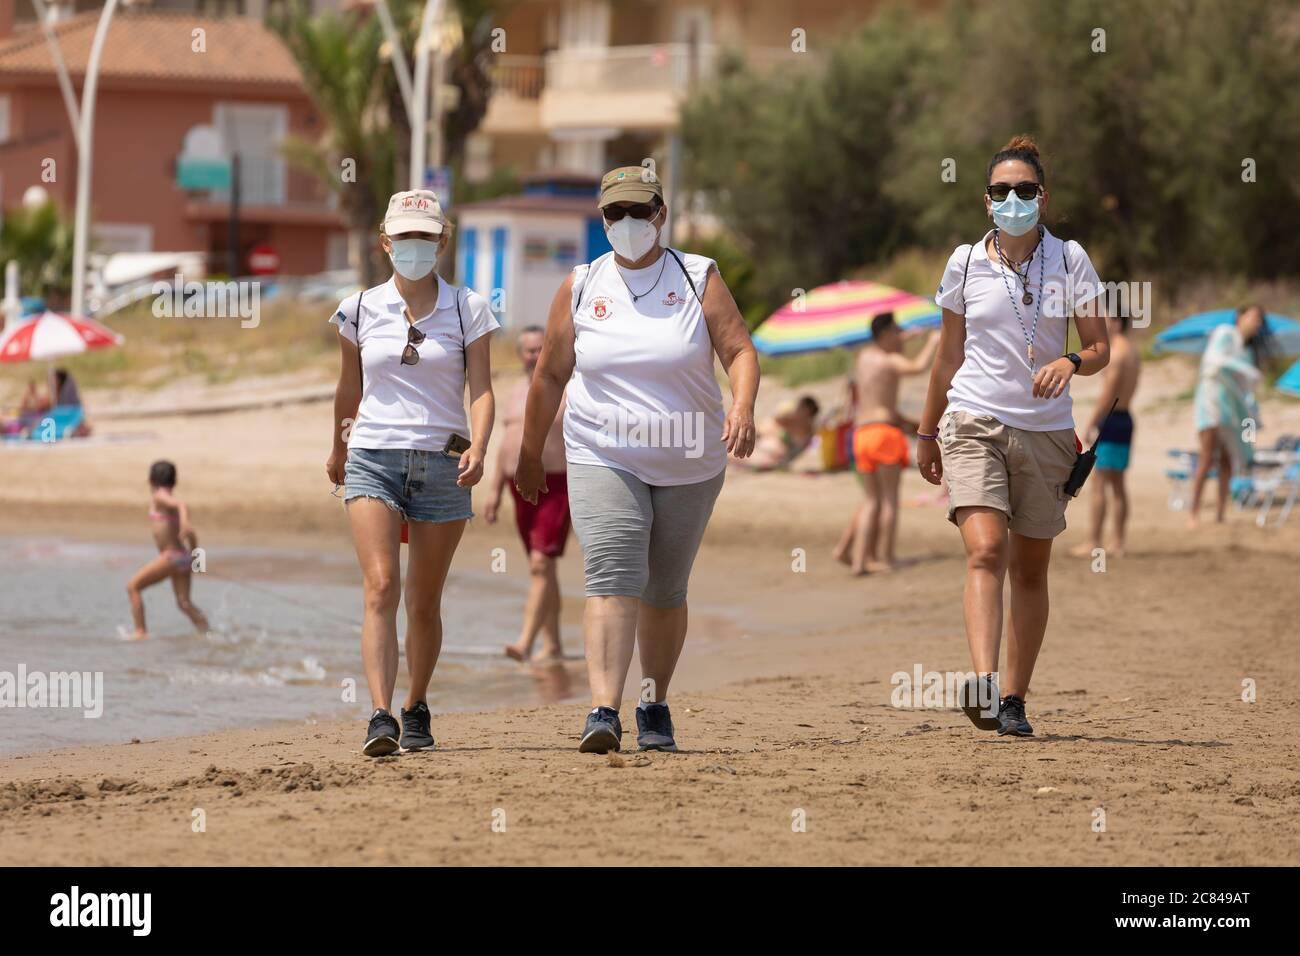 Torrenostra, Castellon, Spain - July 16, 2020: Beach assistants and attendants, work on the beach informing to help beachgoers to prevent coronavirus. Stock Photo